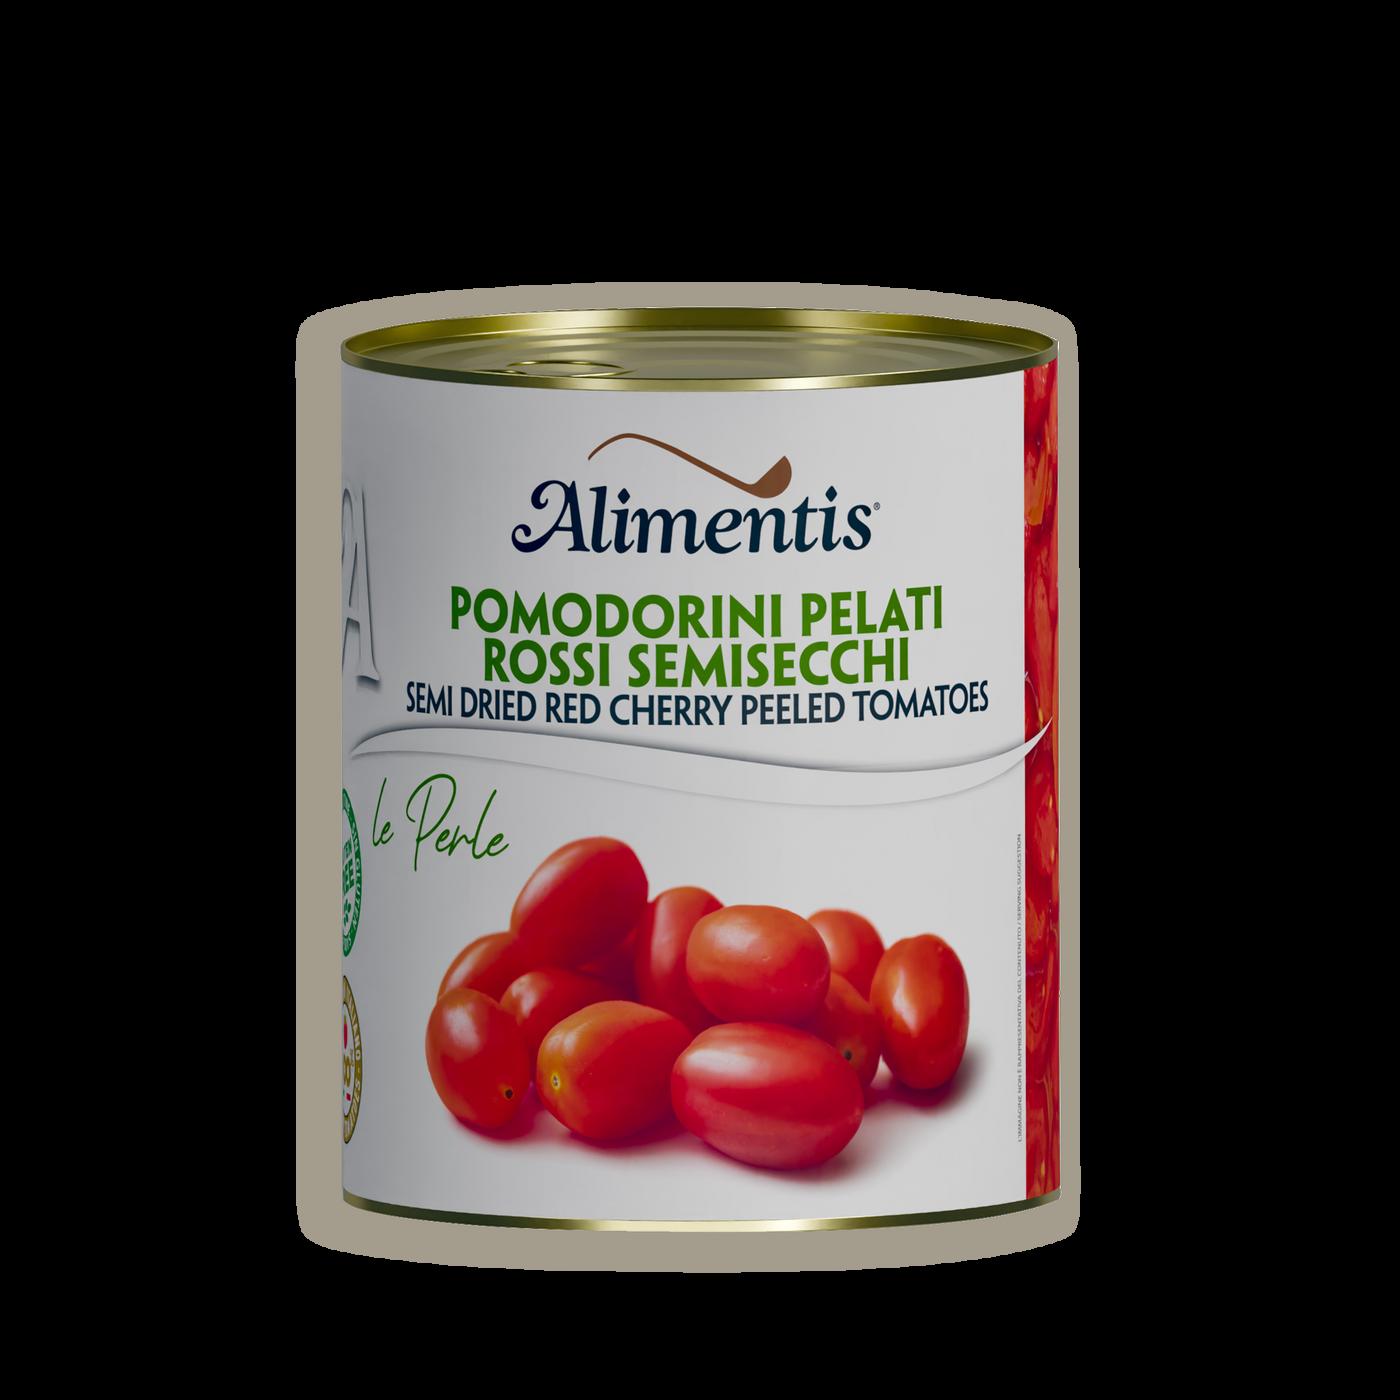 Tomates cherry rojos semisecos